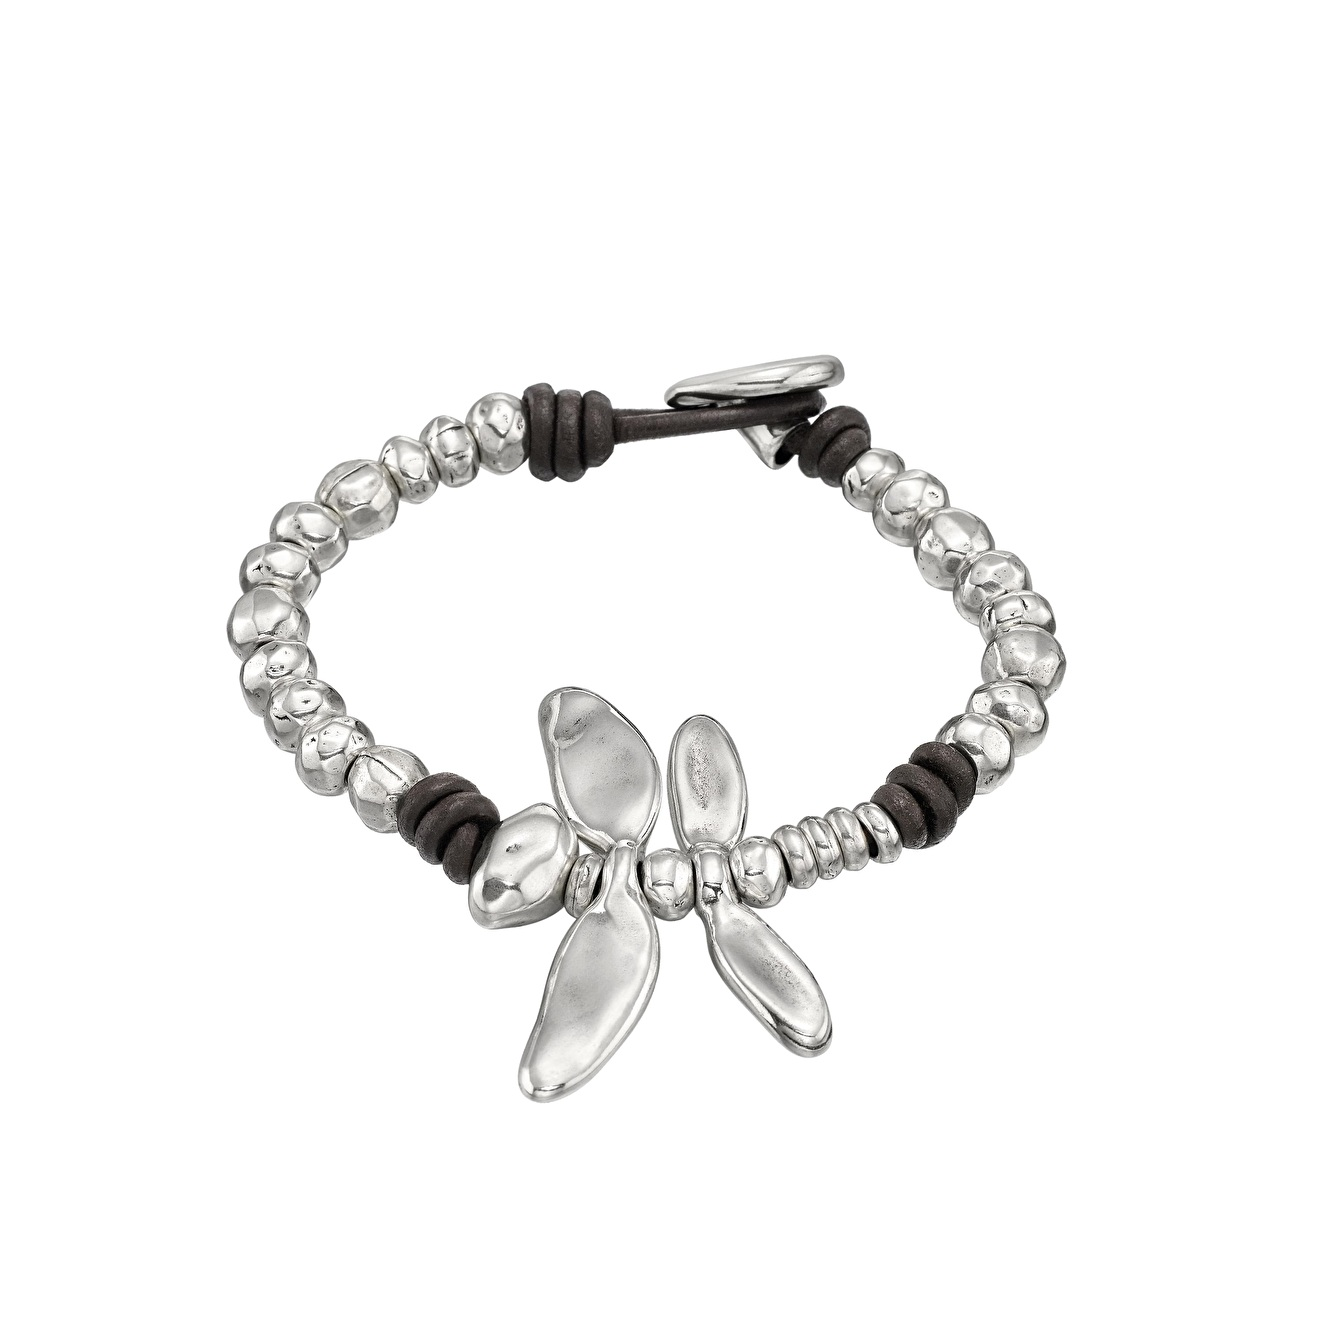 Unode50 Покрытый серебром браслет «Free dragonfly»